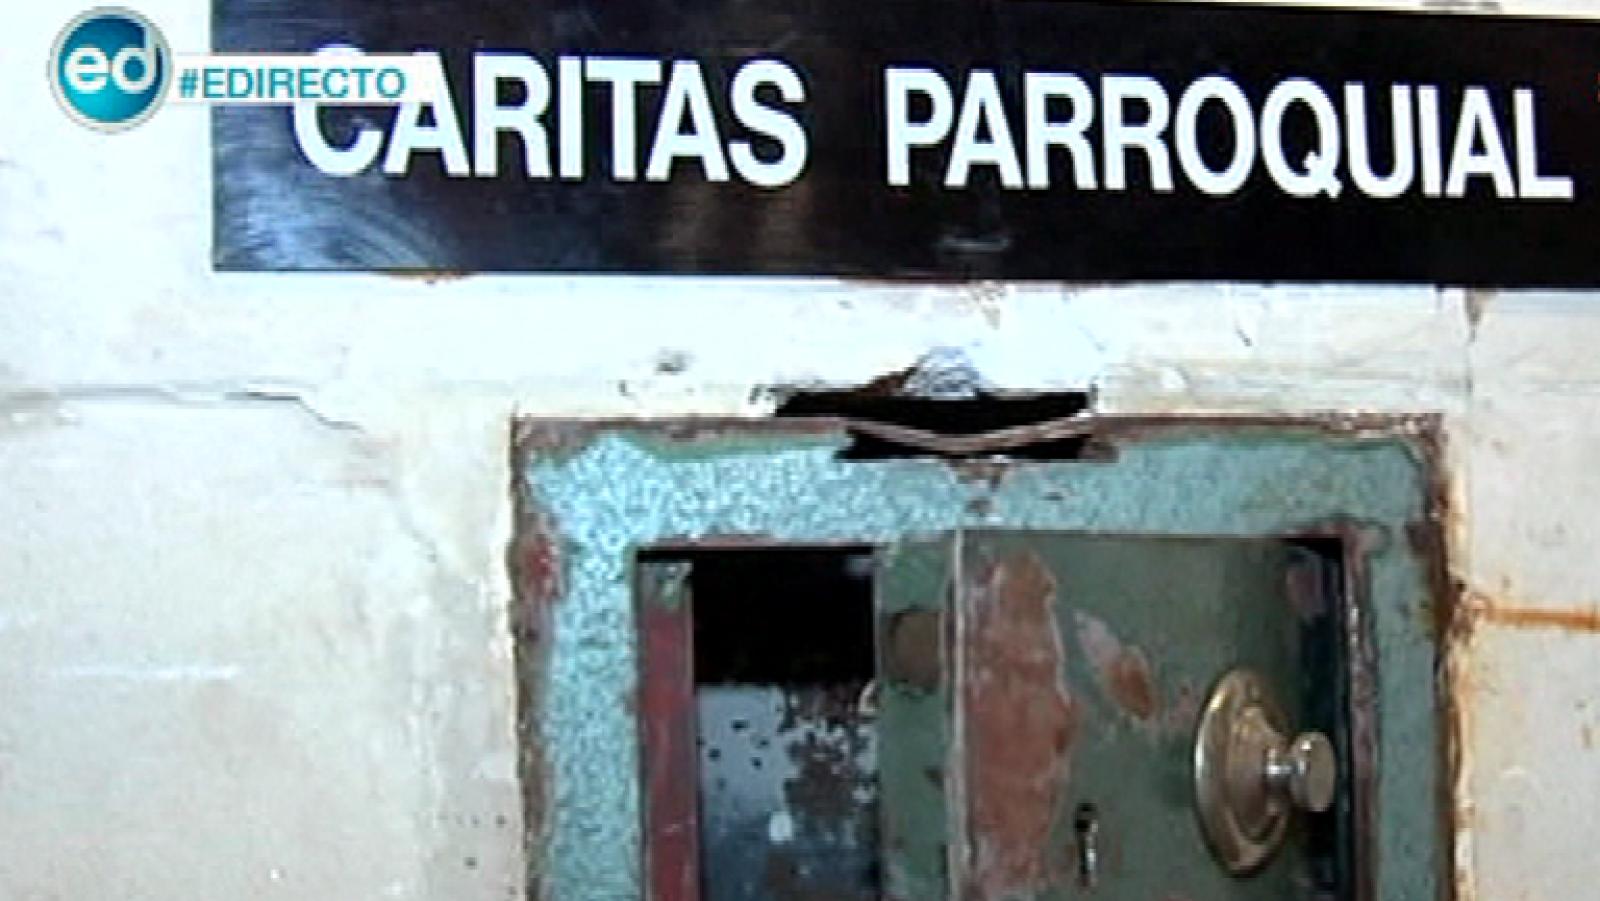 España Directo- Roban 1.000 euros del cepillo de una iglesa de Burgos